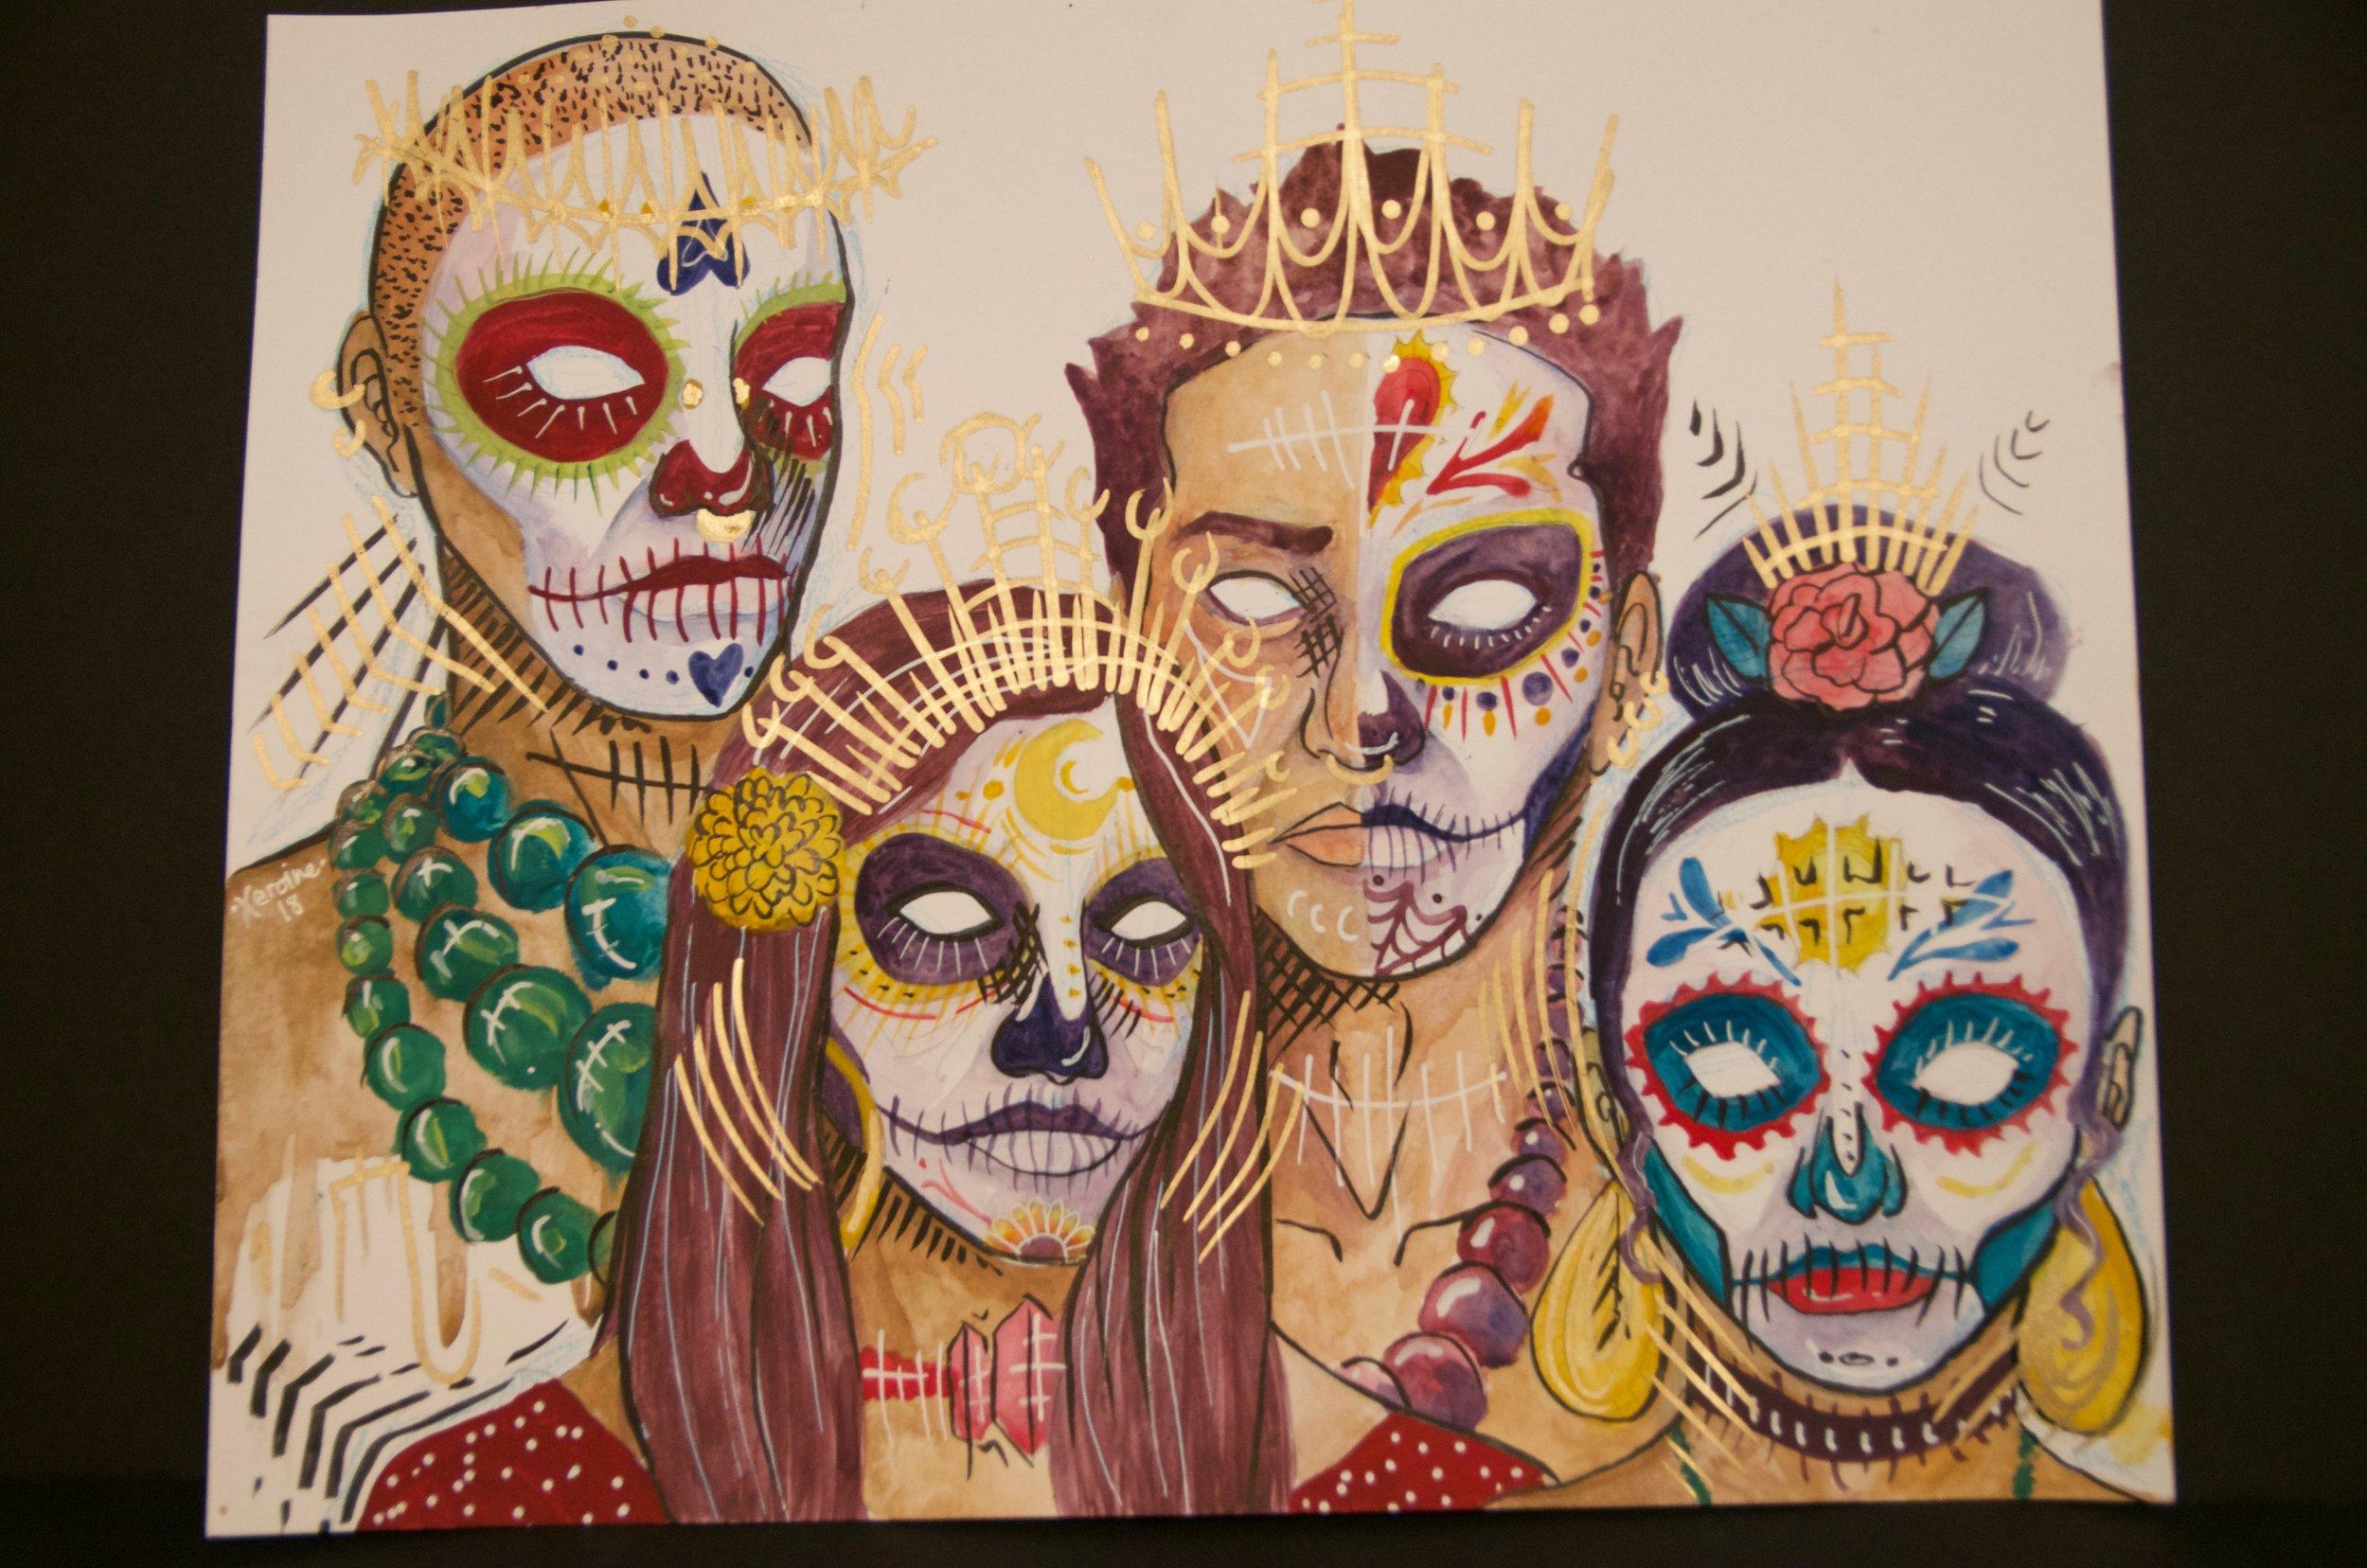 "YESSICA JIMENEZ   Watercolor and pen on paper | 14""x17"" (unframed)   Value:  $200 |  Minimum bid:  $75"